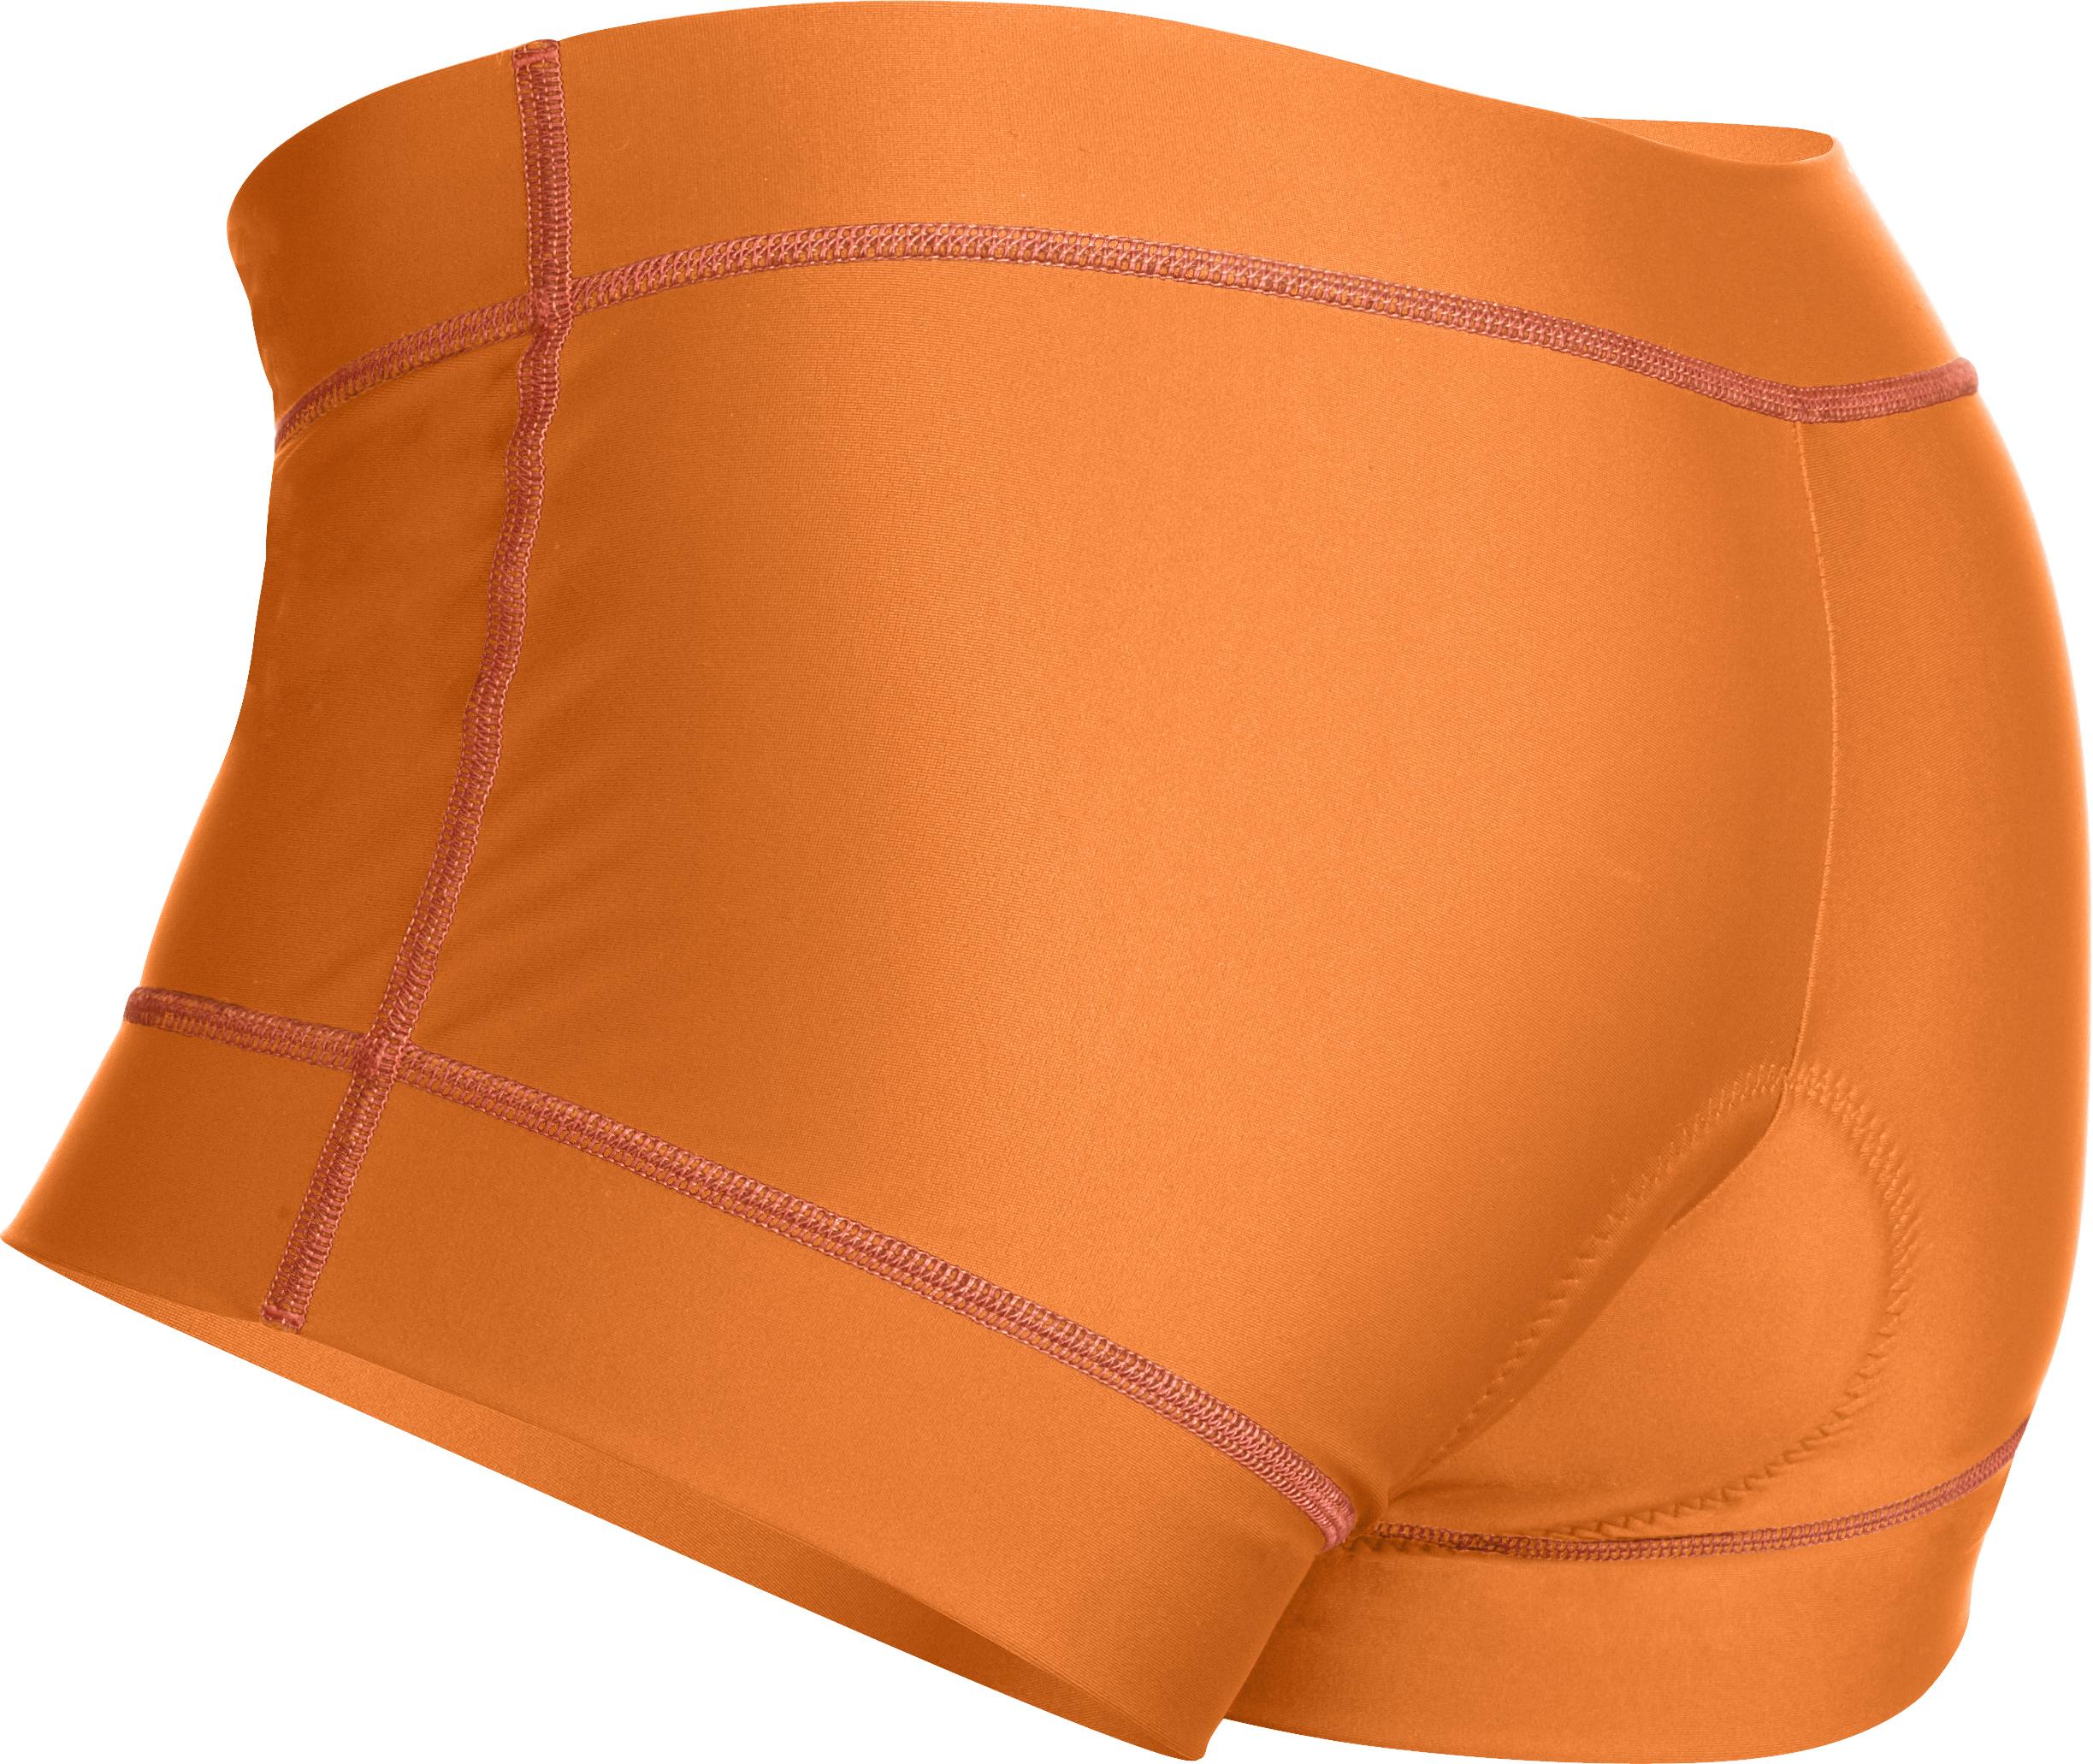 Tangerine Bloomers